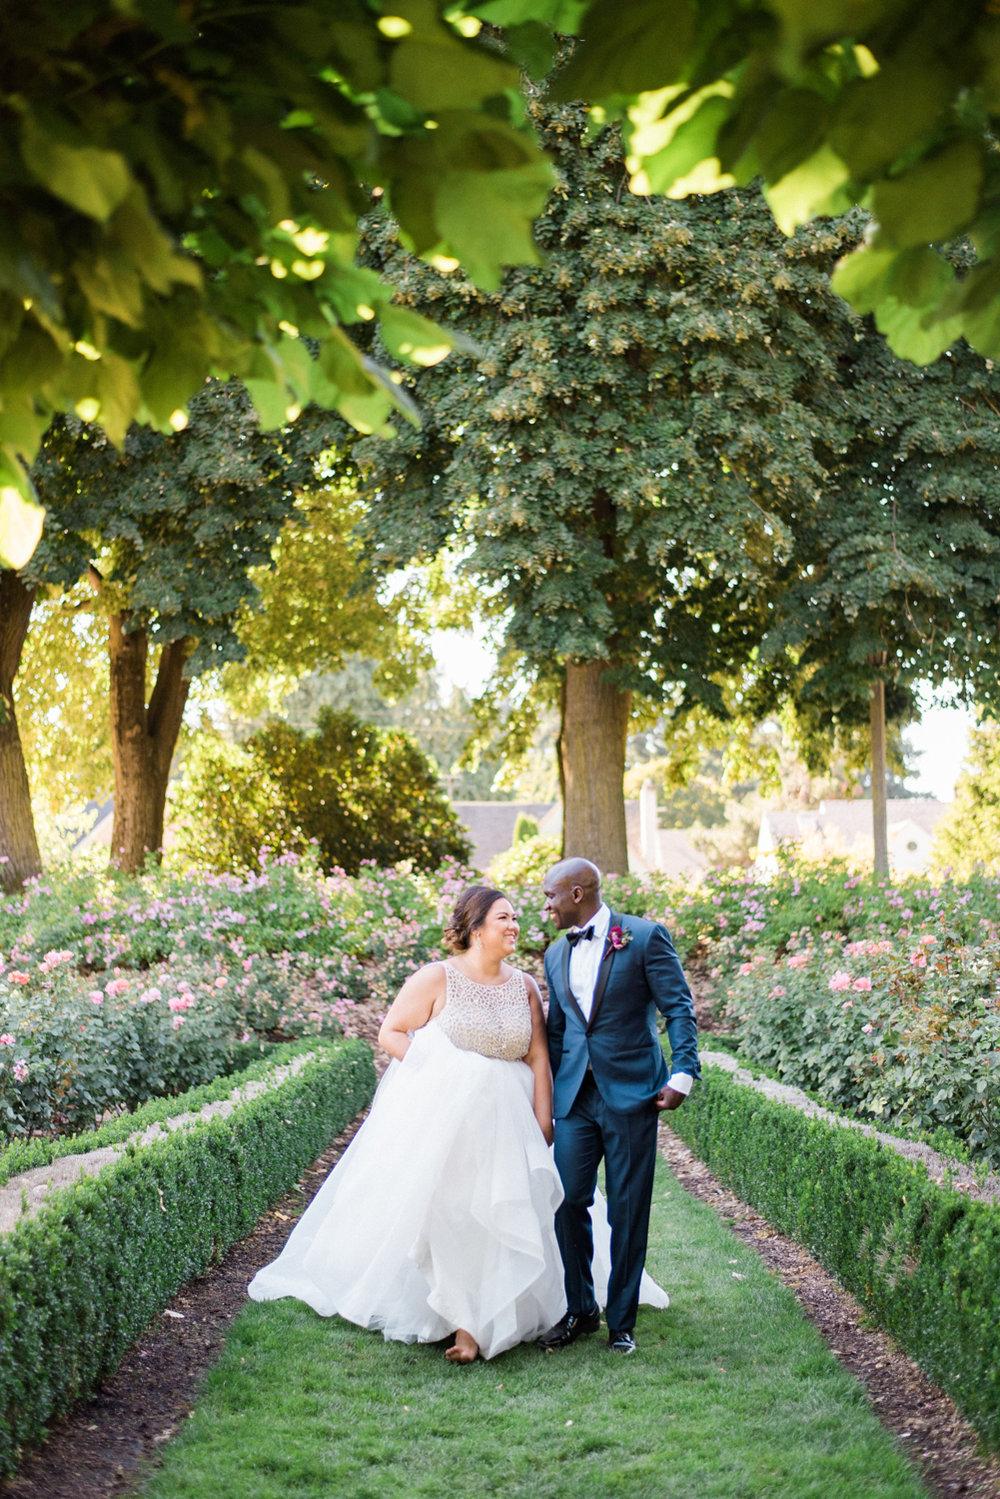 peninsula-park-rose-garden-portland-wedding-shelley-marie-photo-1.jpg